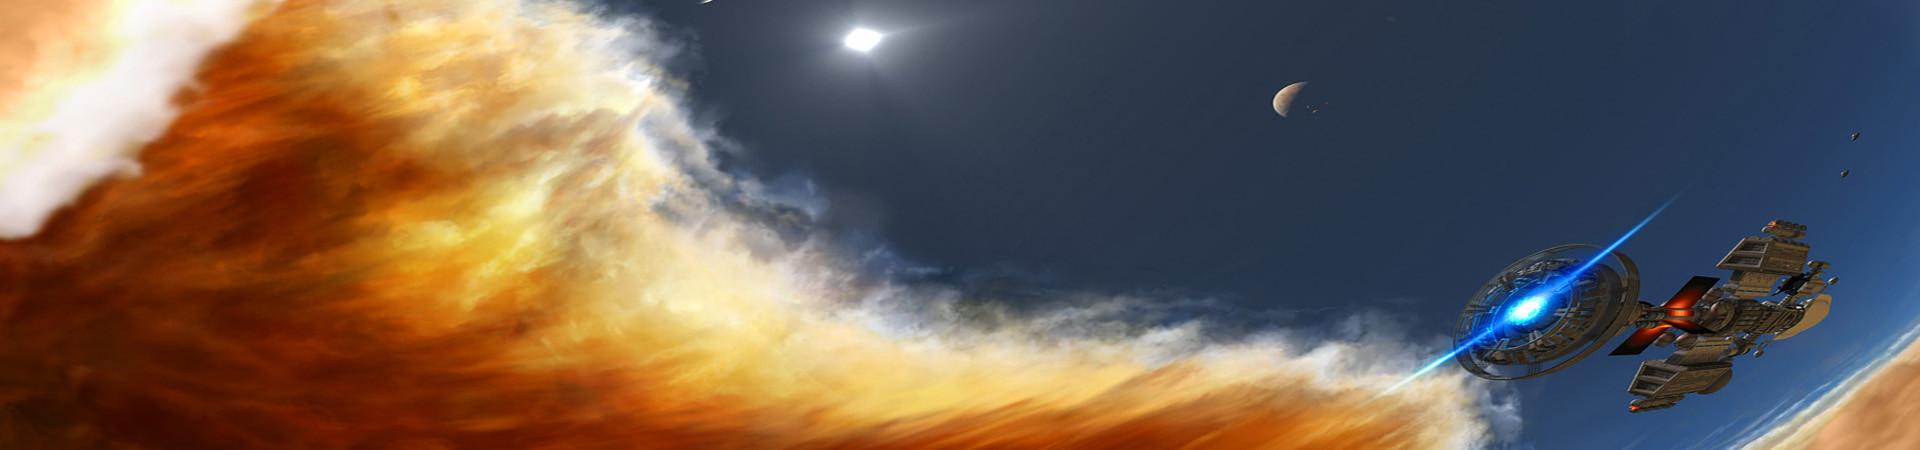 Planeten - Expedition ins Sonnensystem Header kl.